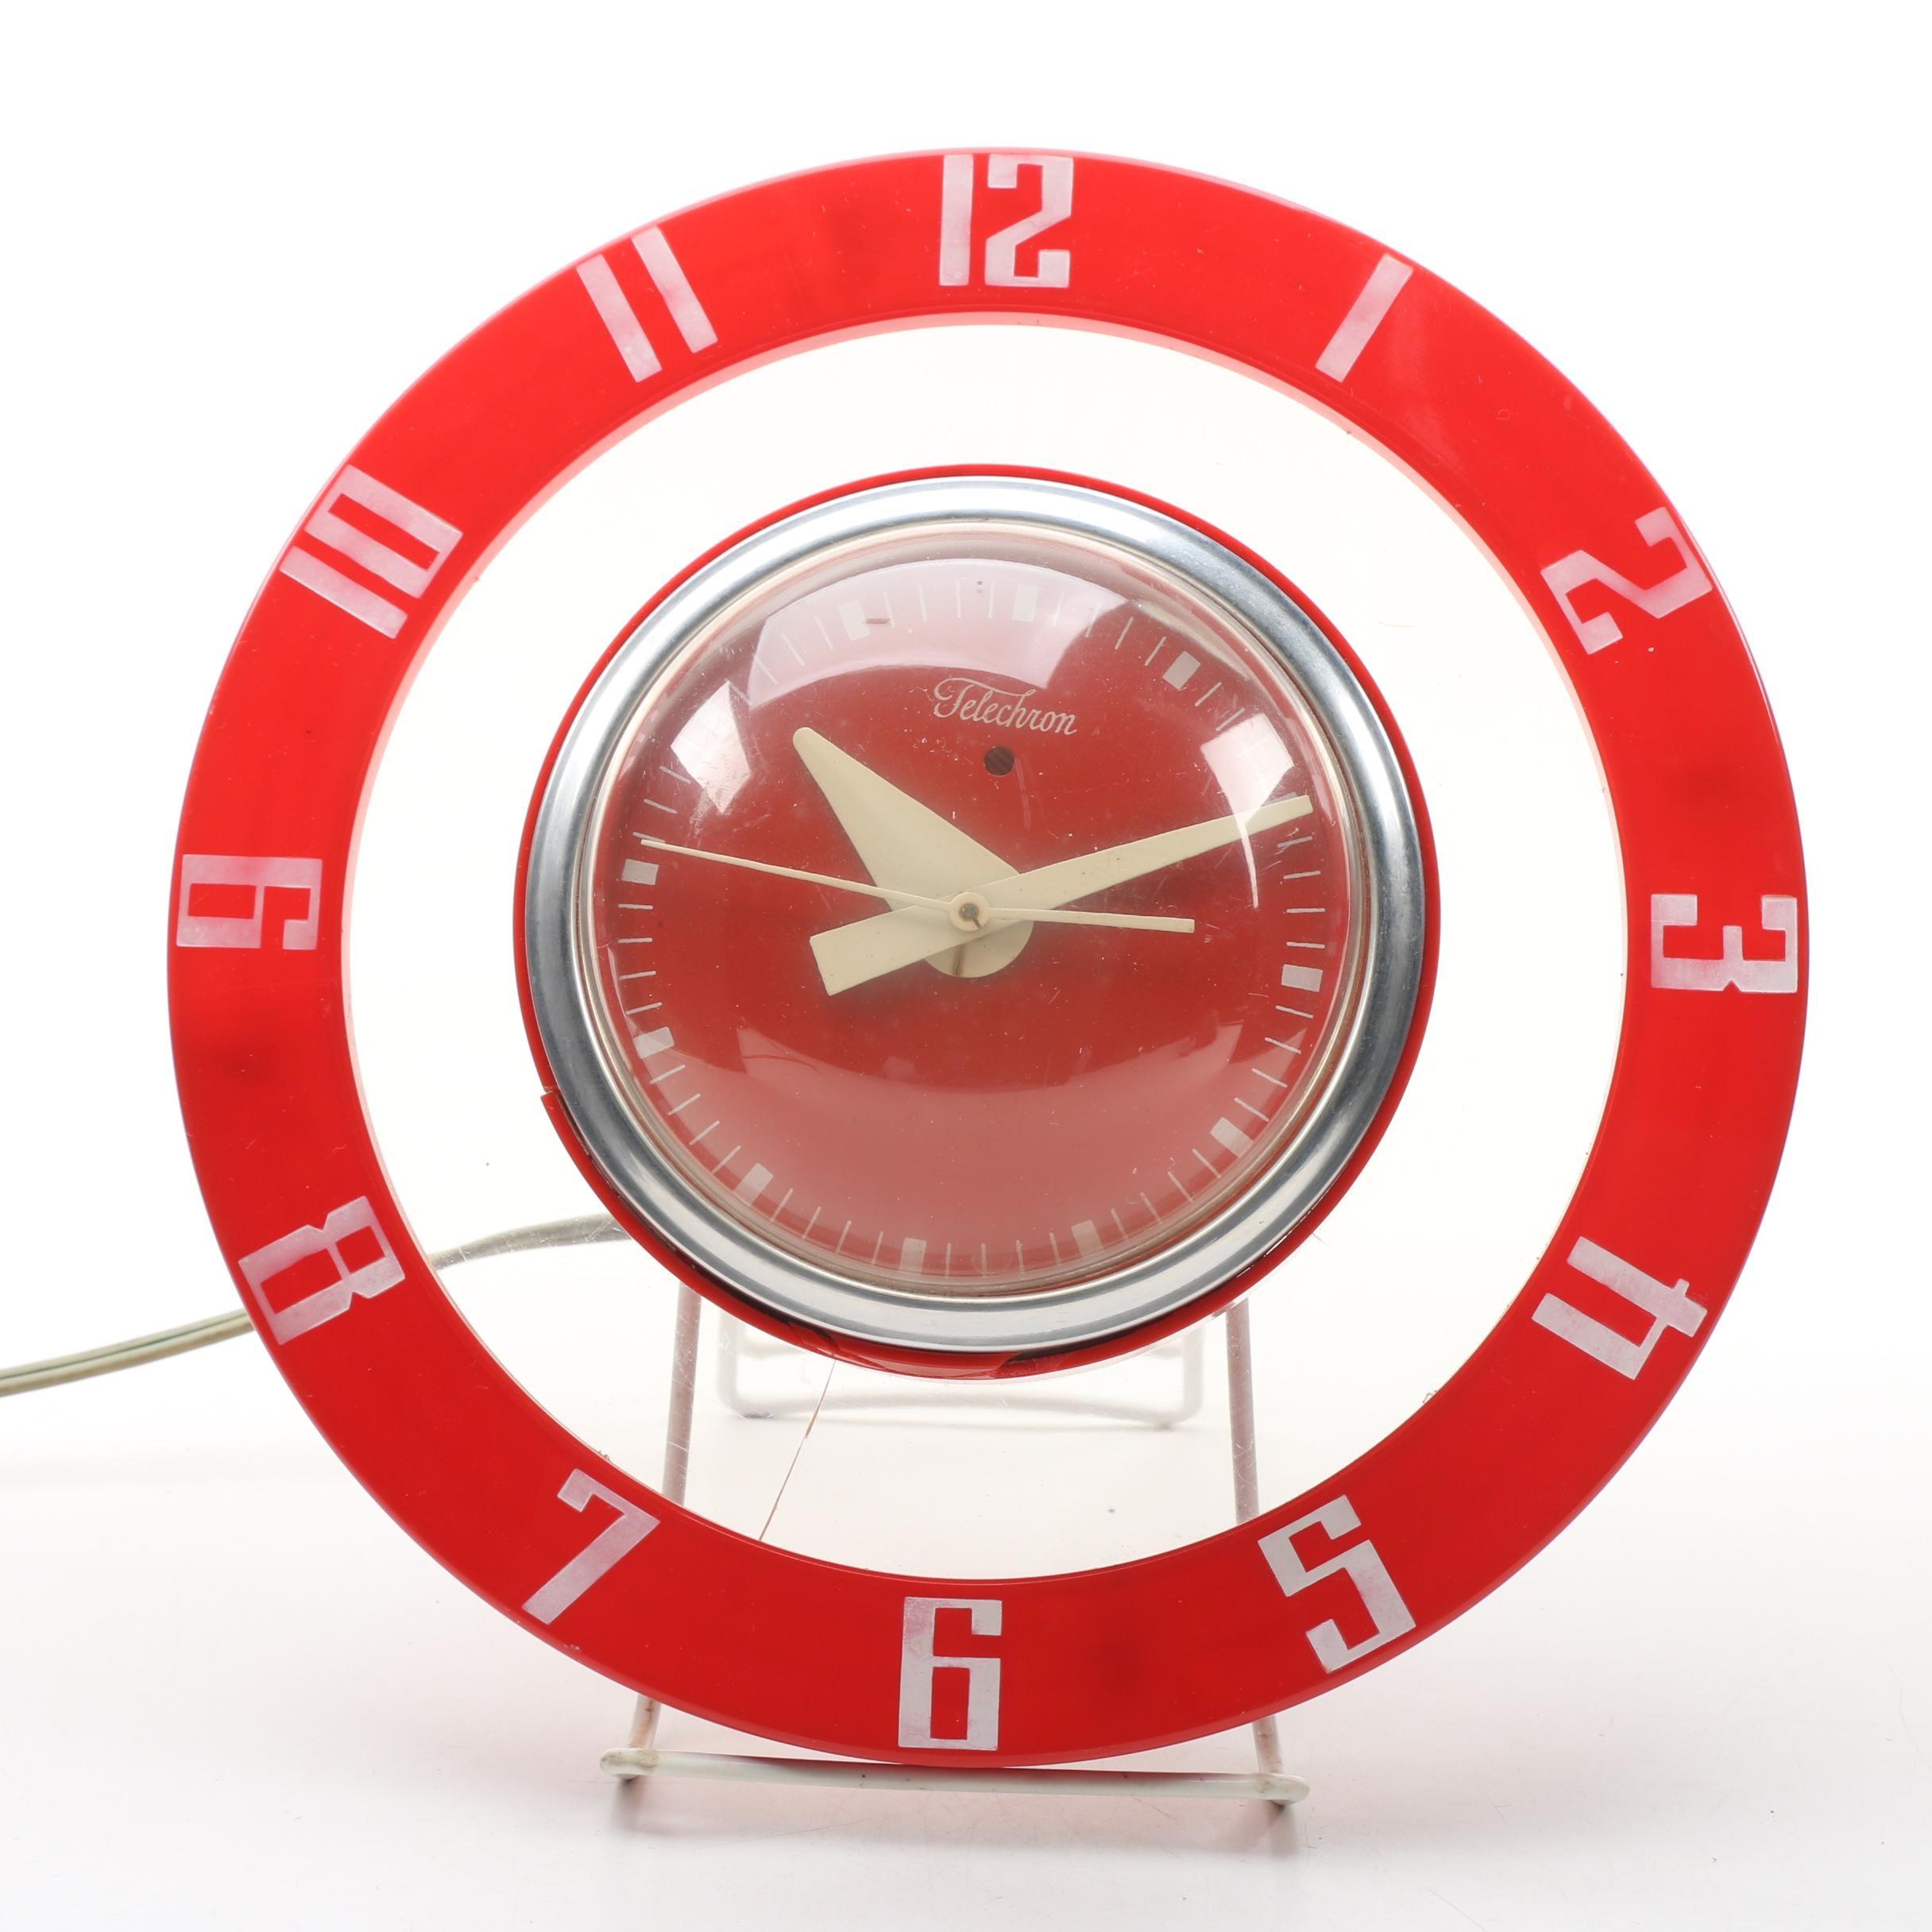 Telechron 2H39 Wall Clock, Mid-Century